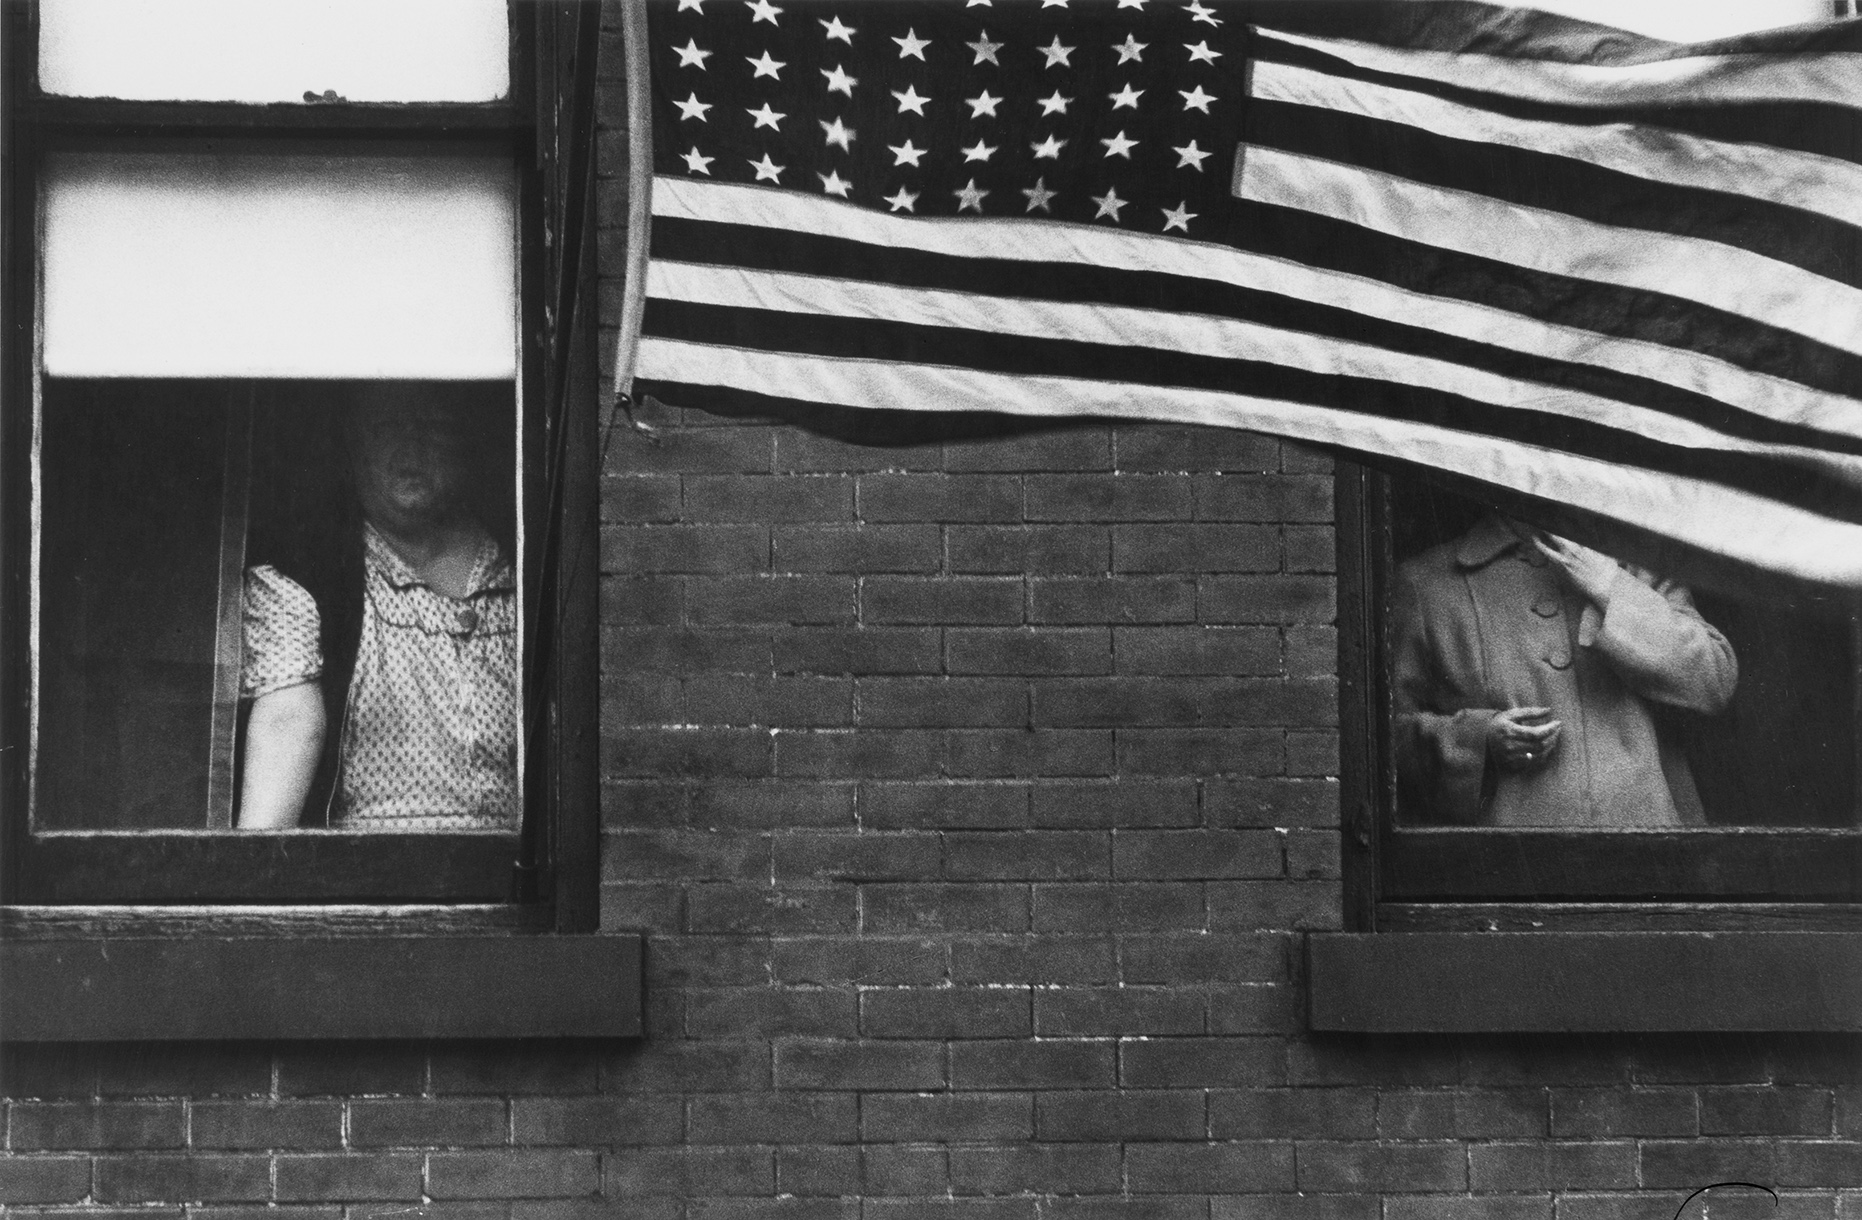 Parade-- Hoboken, New Jersey, 1955 by Robert Frank.